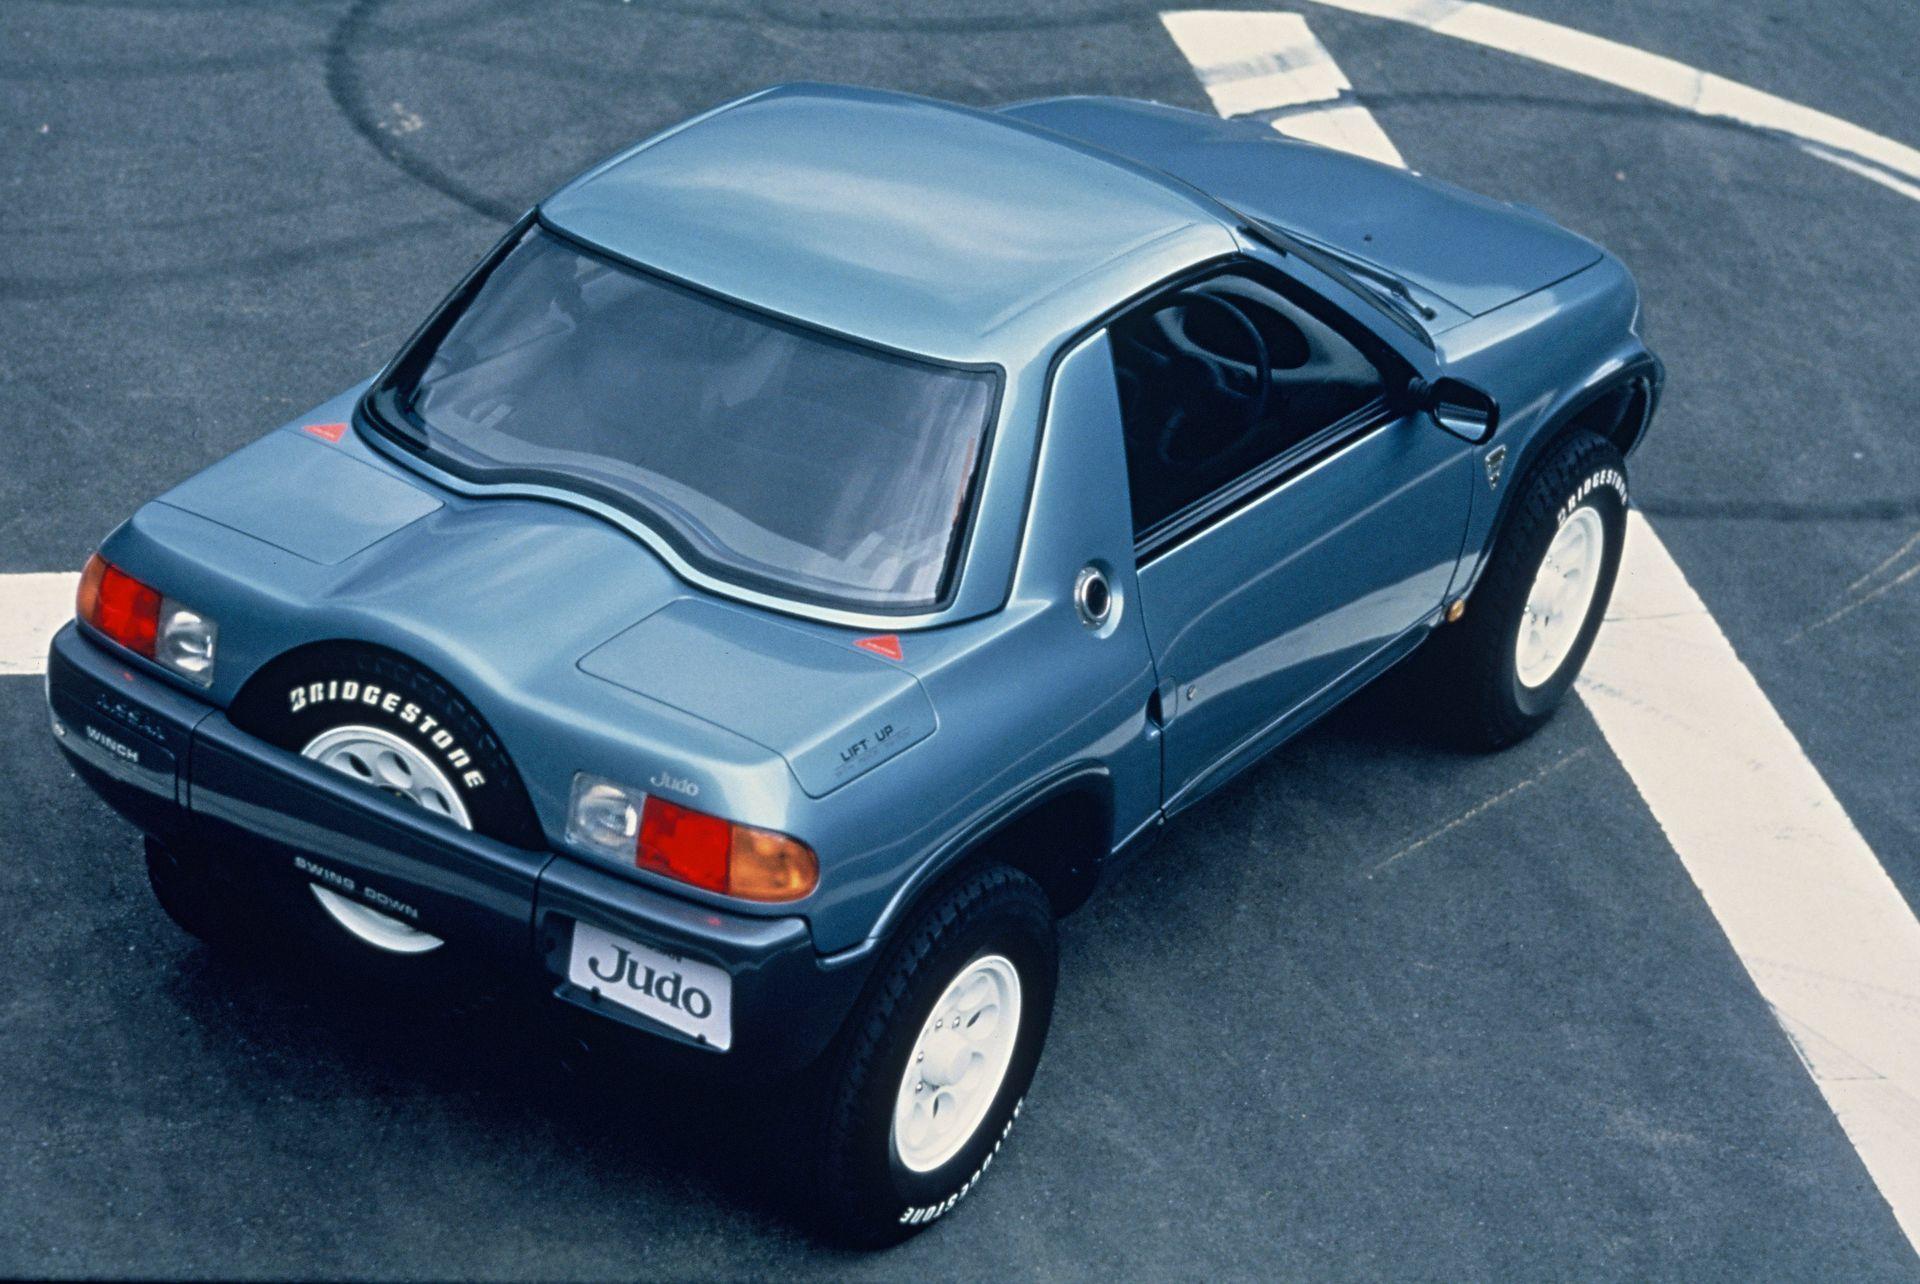 Nissan Judo Concept 13